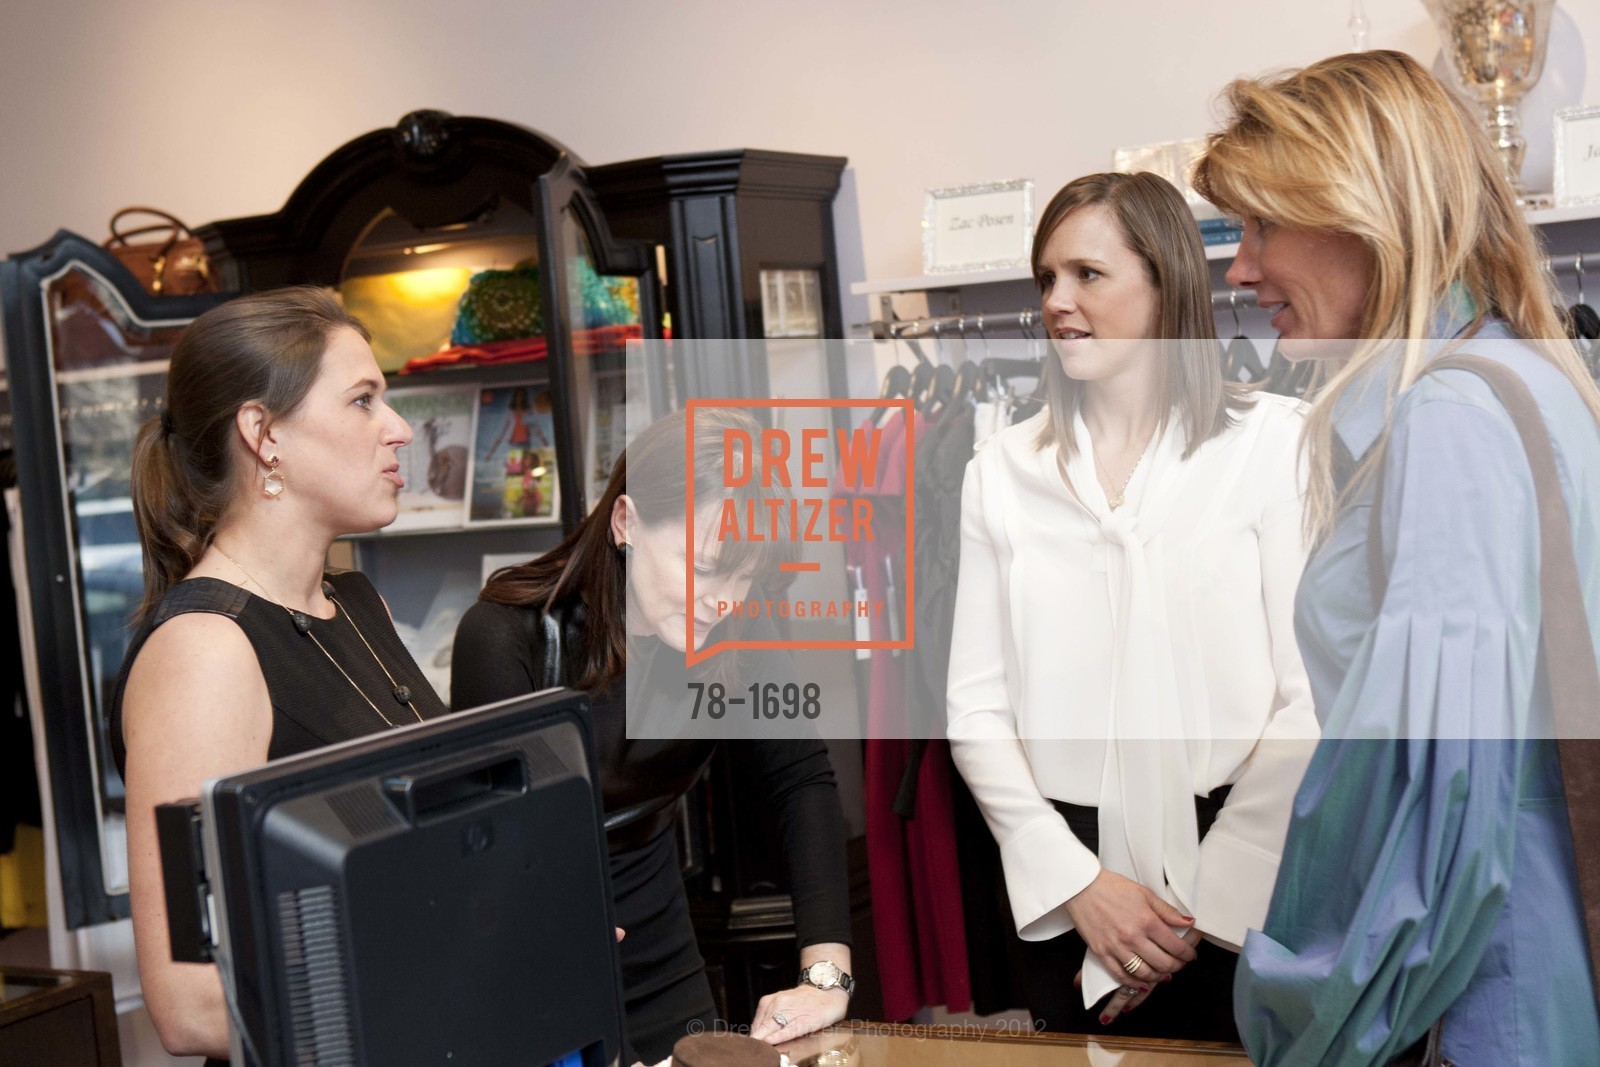 Daria de Koning, Allison Speer, Jessica Moment, Susan Dunlevy, Photo #78-1698